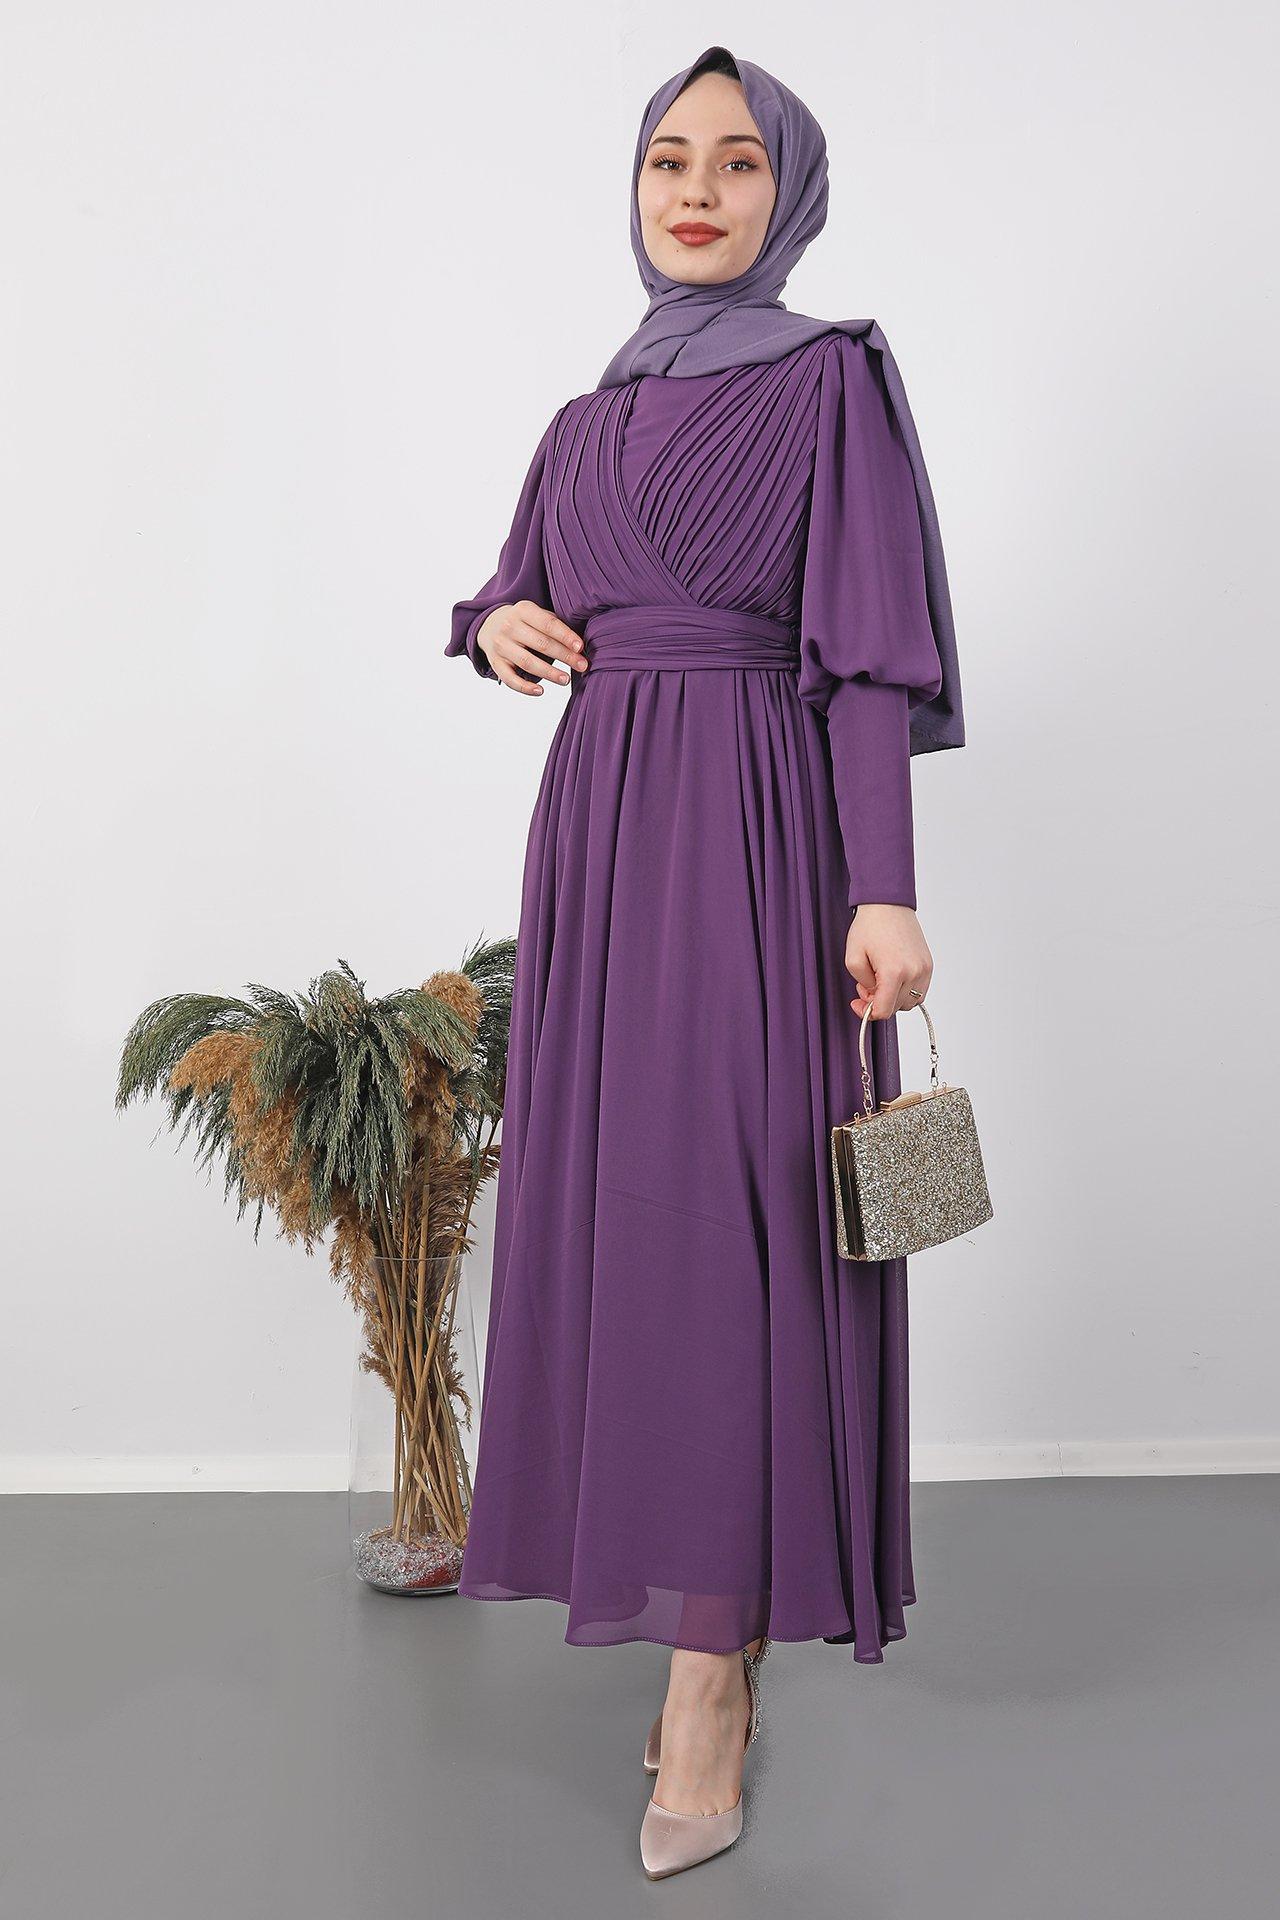 GİZAGİYİM - Kolu Manşetli Piliseli Elbise Mor